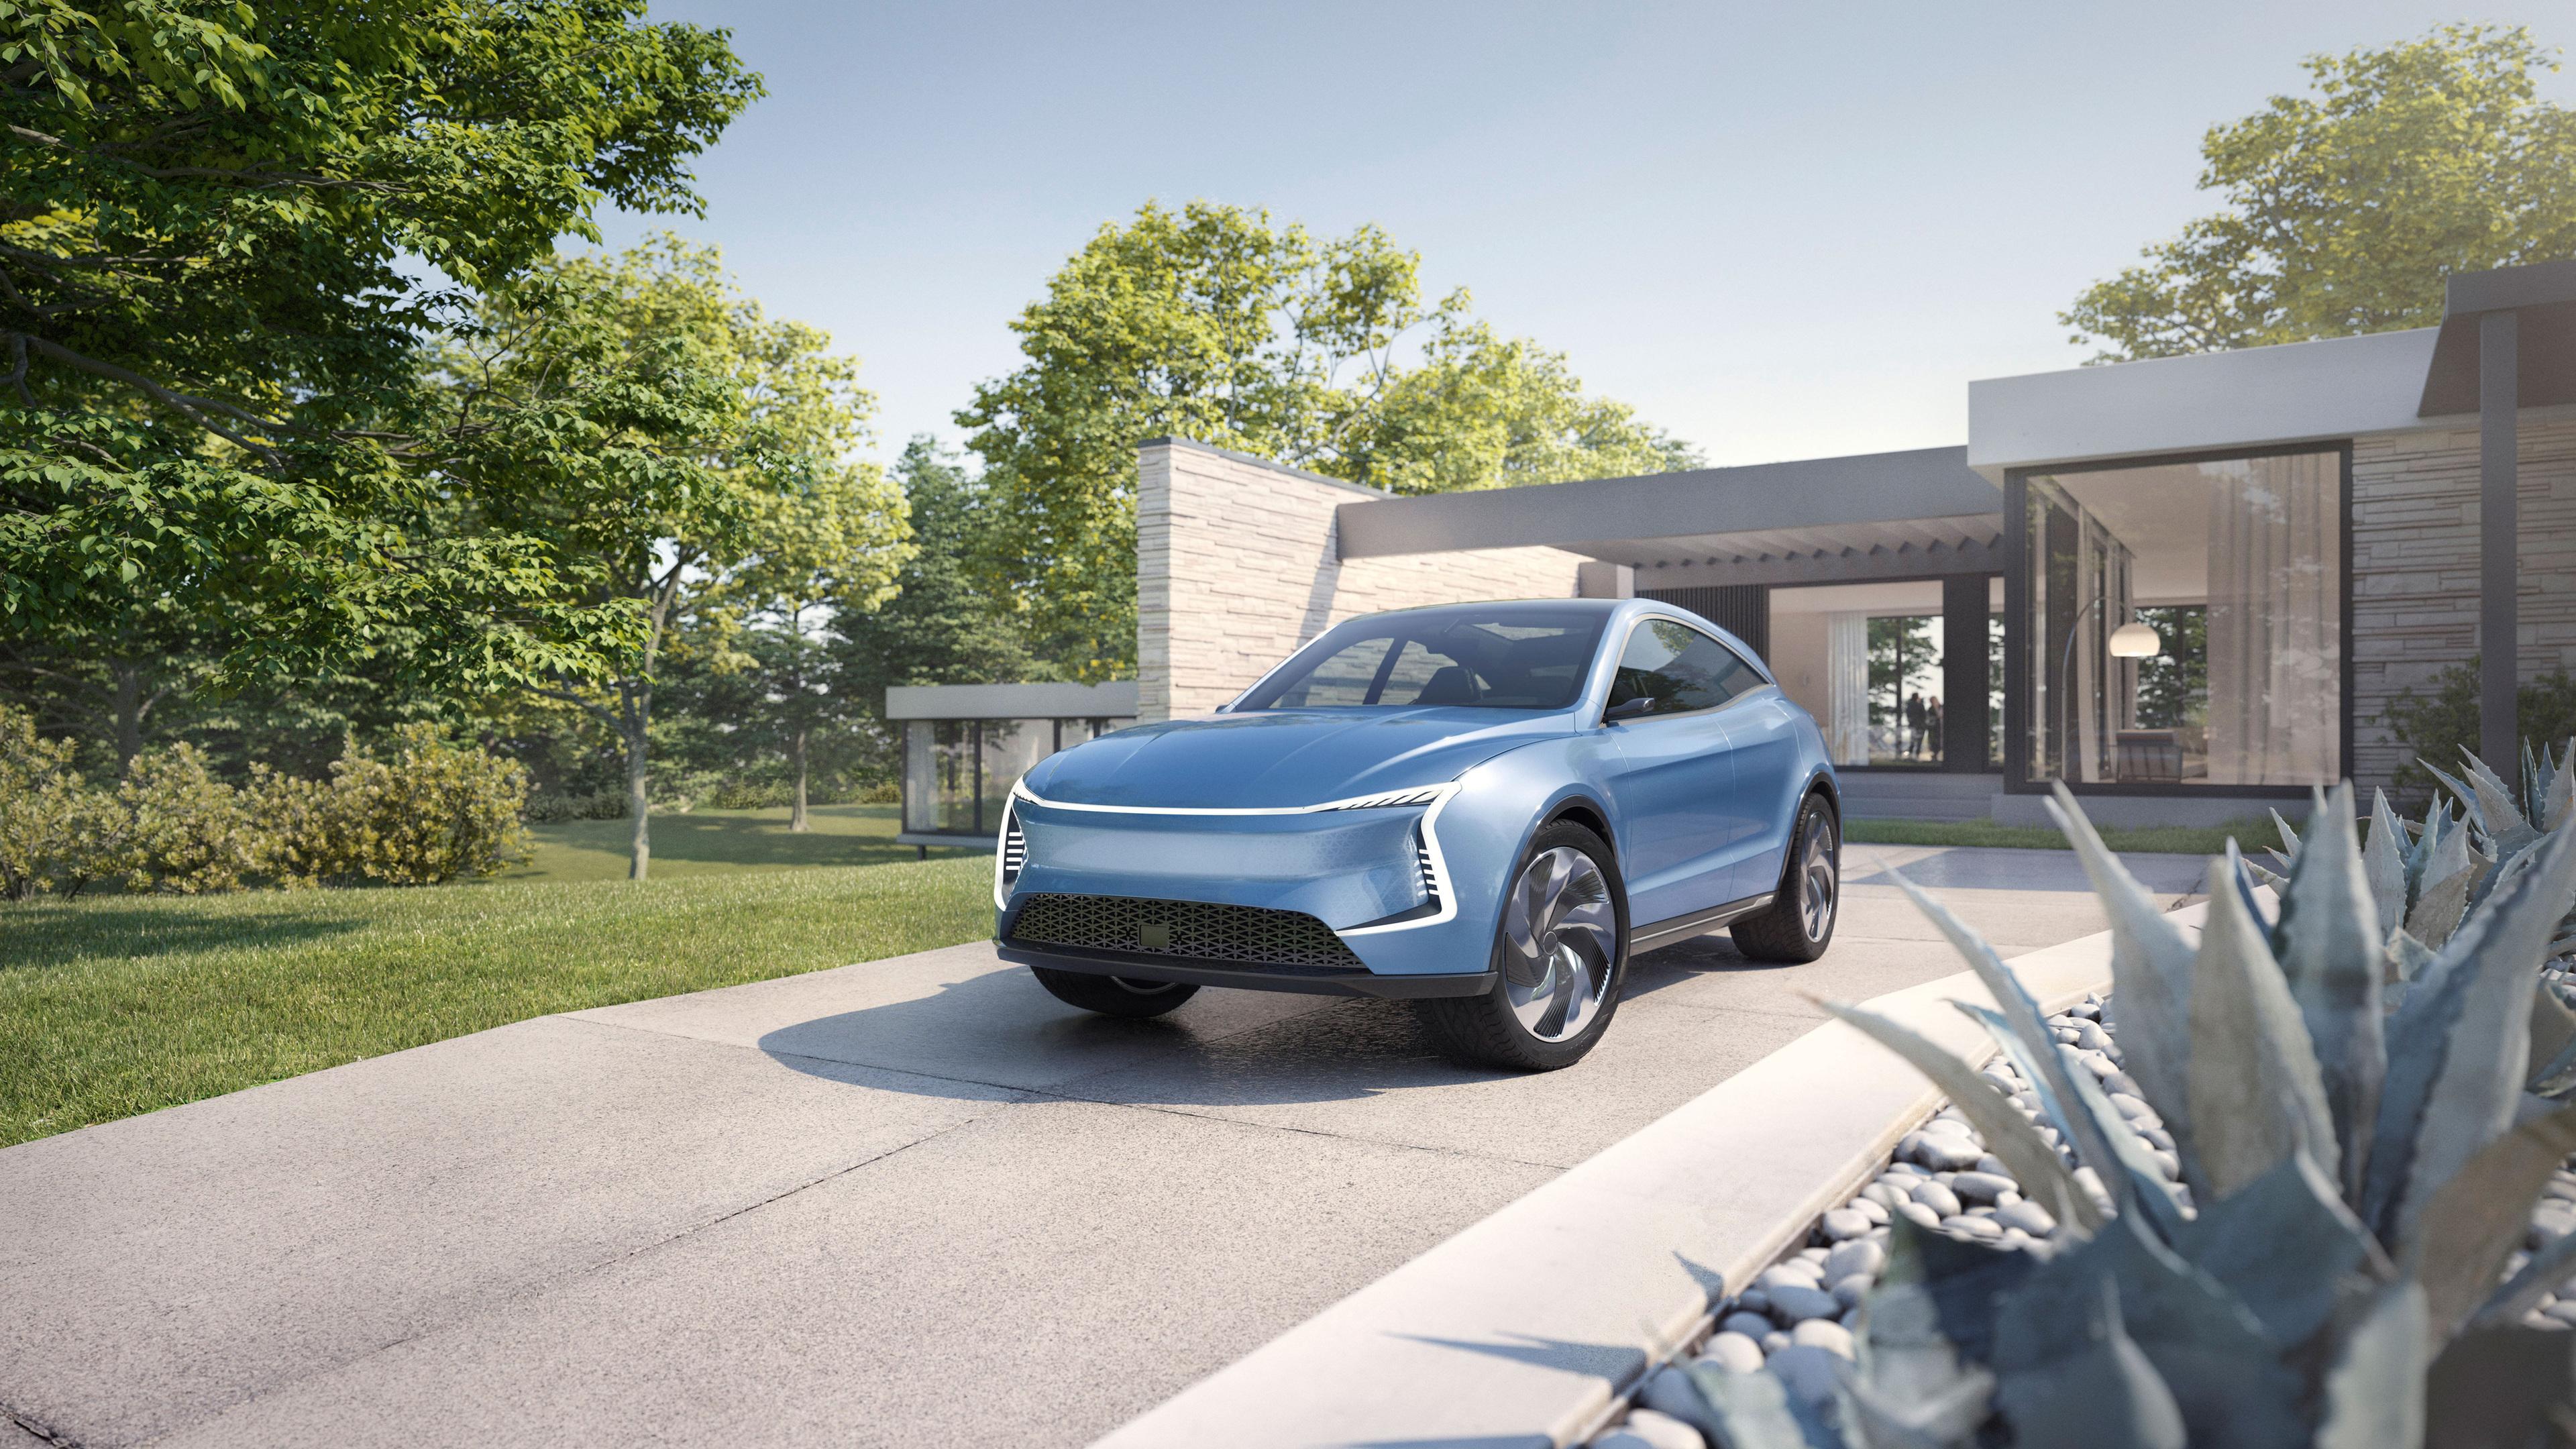 2019 sf motors sf5 concept car 4k 1539110666 - 2019 SF Motors SF5 Concept Car 4k - sf motors wallpapers, sf motors sf5 wallpapers, hd-wallpapers, concept cars wallpapers, 4k-wallpapers, 2019 cars wallpapers